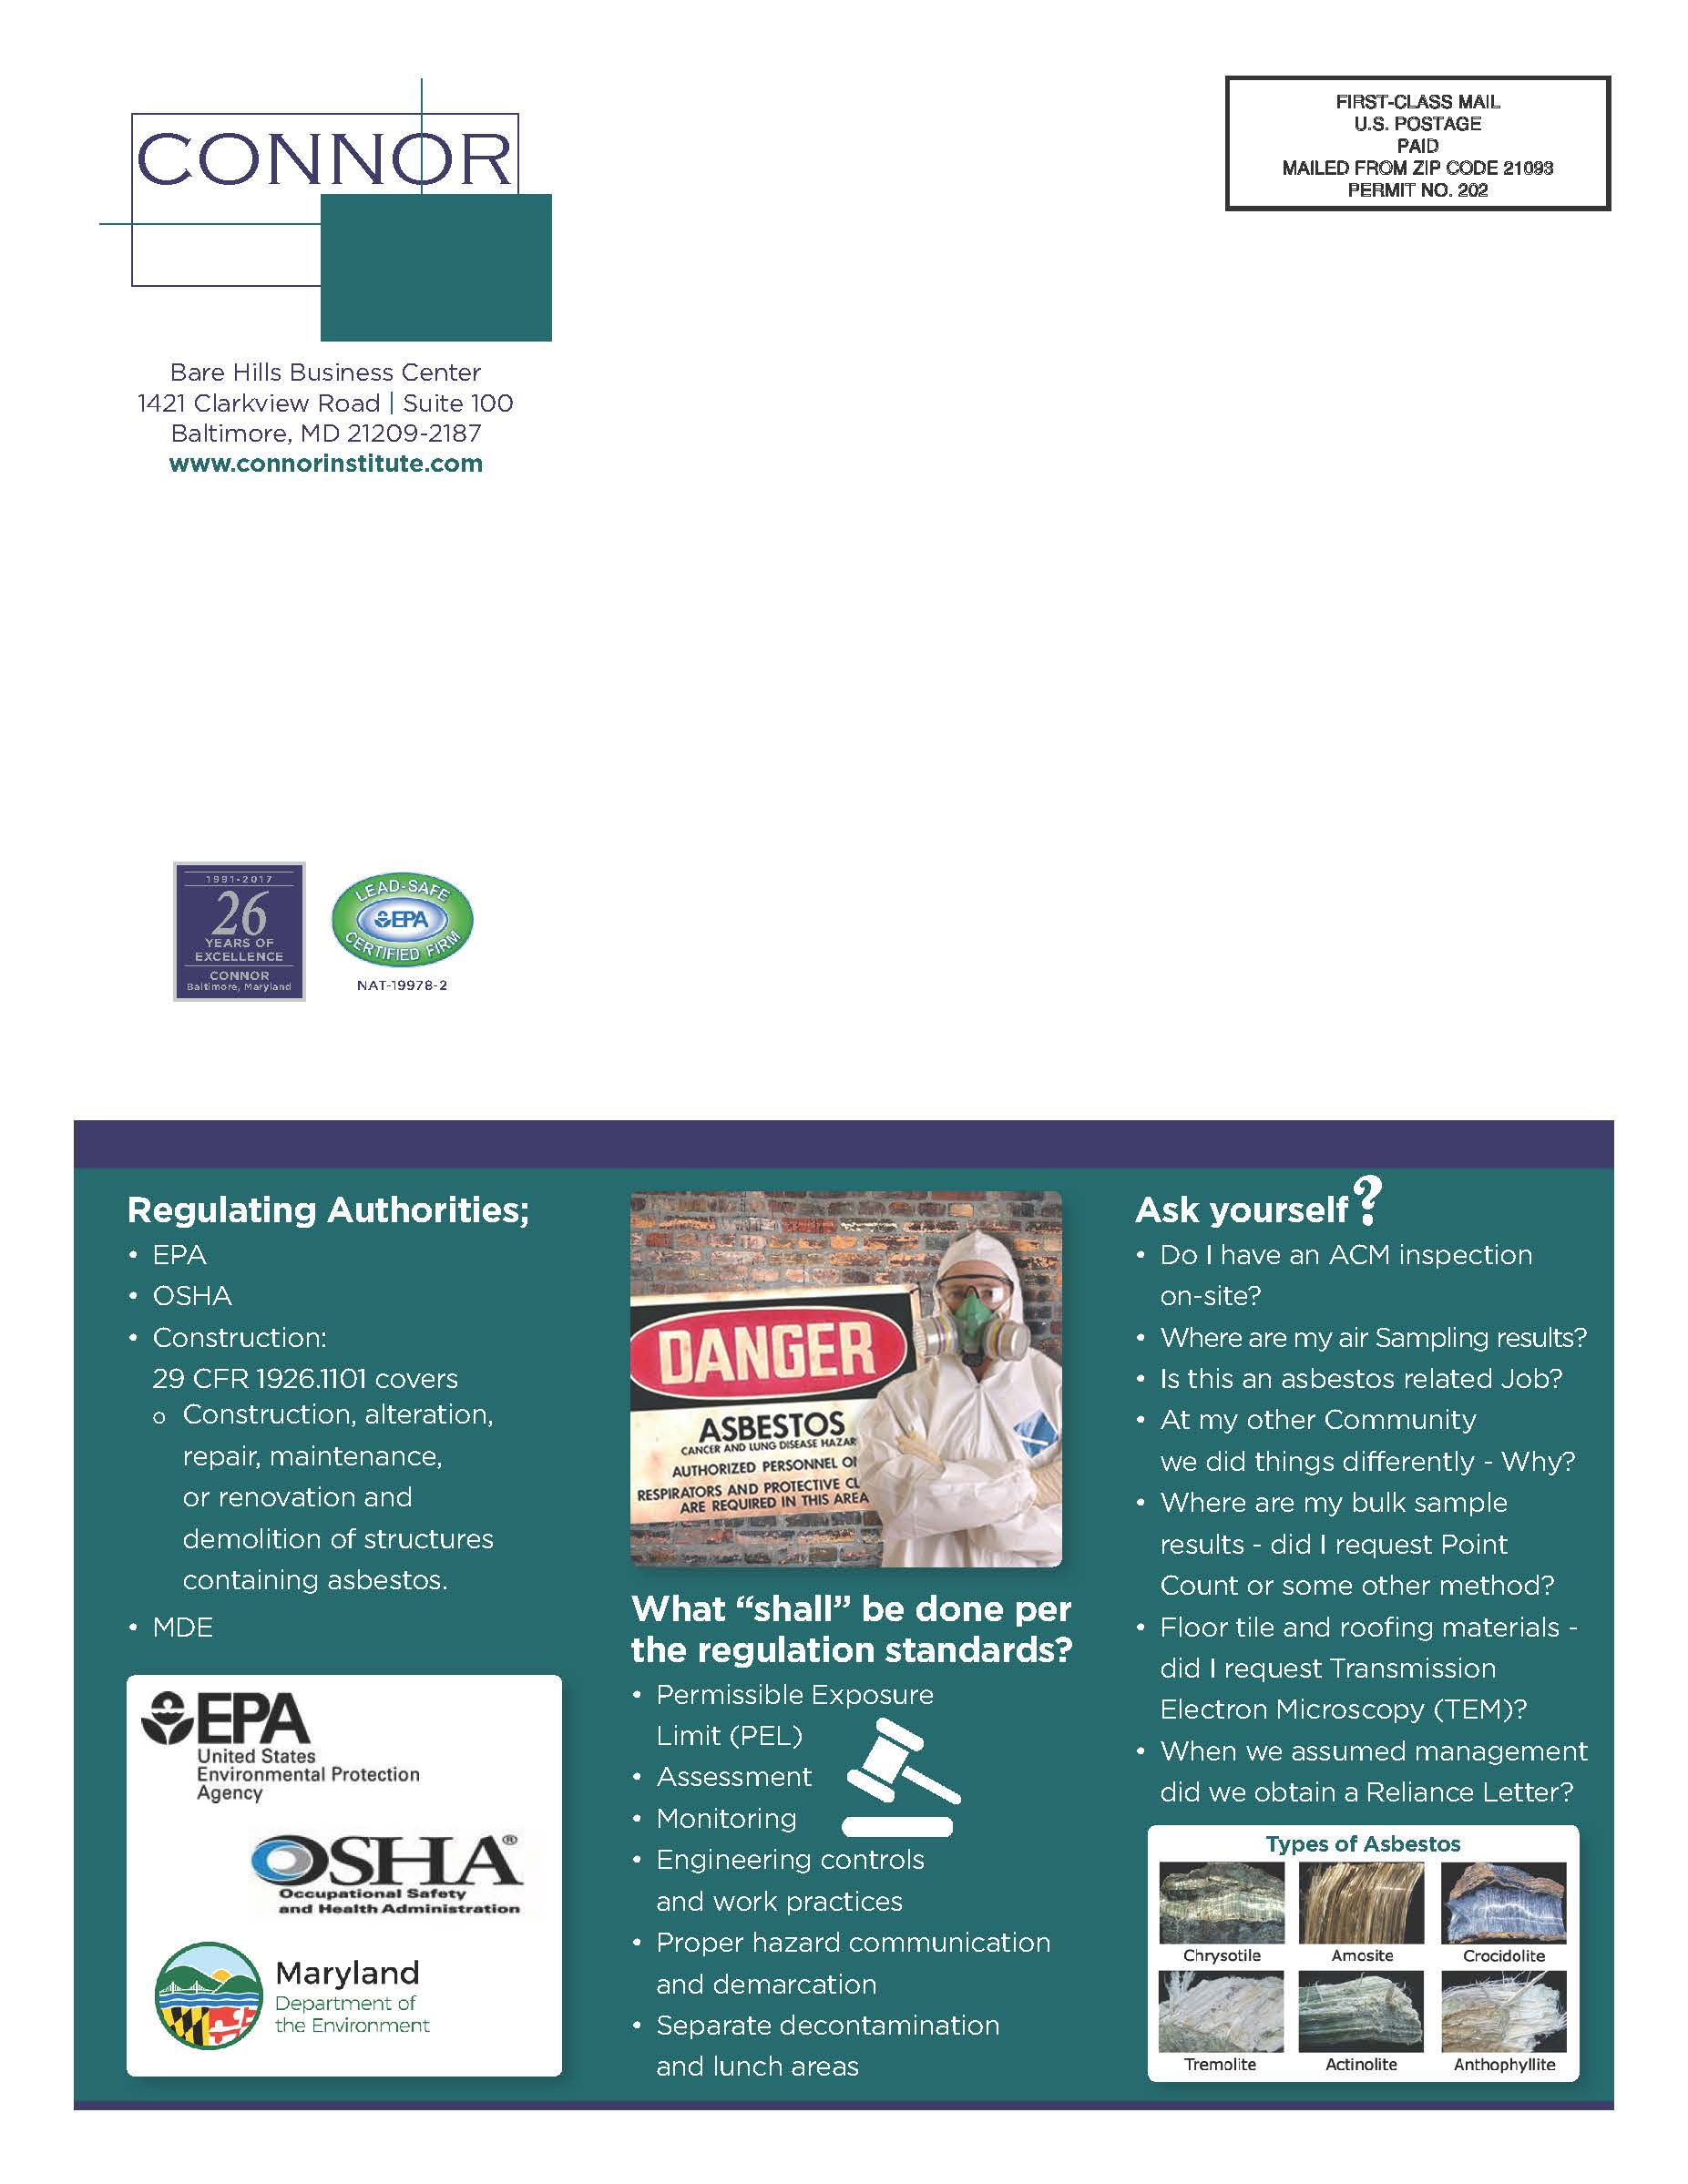 Compliance_Corner_Asbestos_FINAL_Page_2.jpg